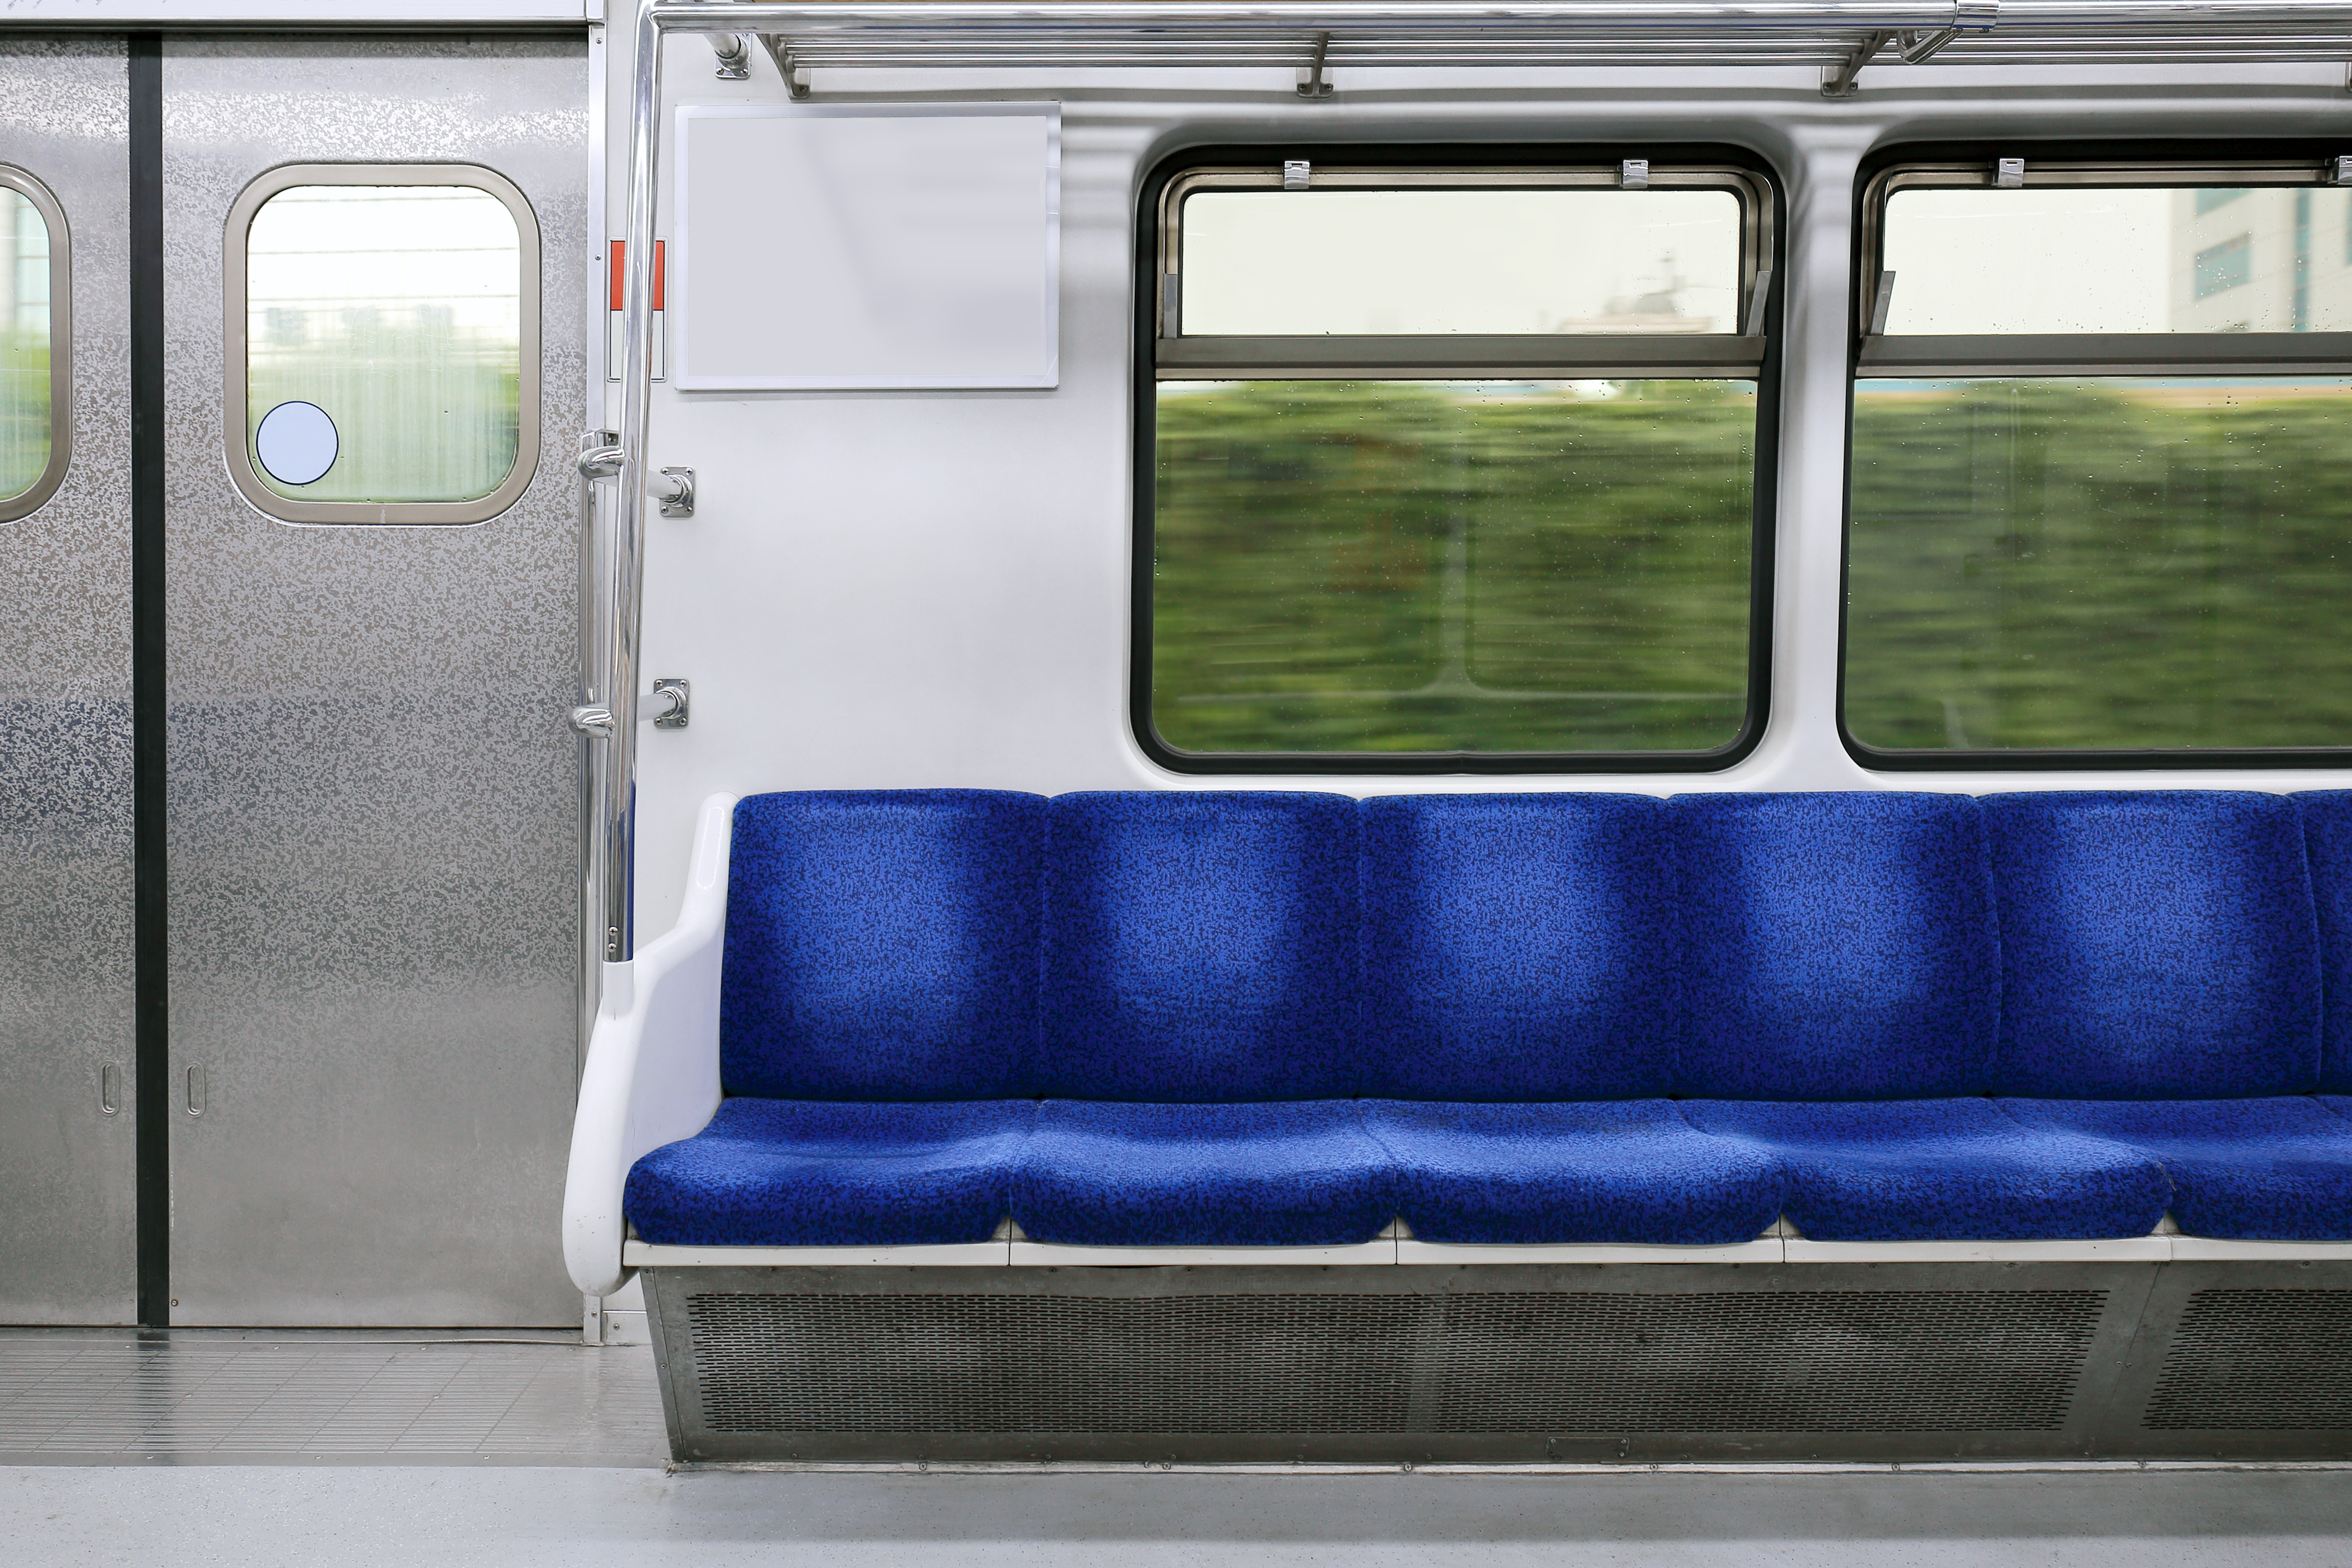 train from osan thumb.jpg